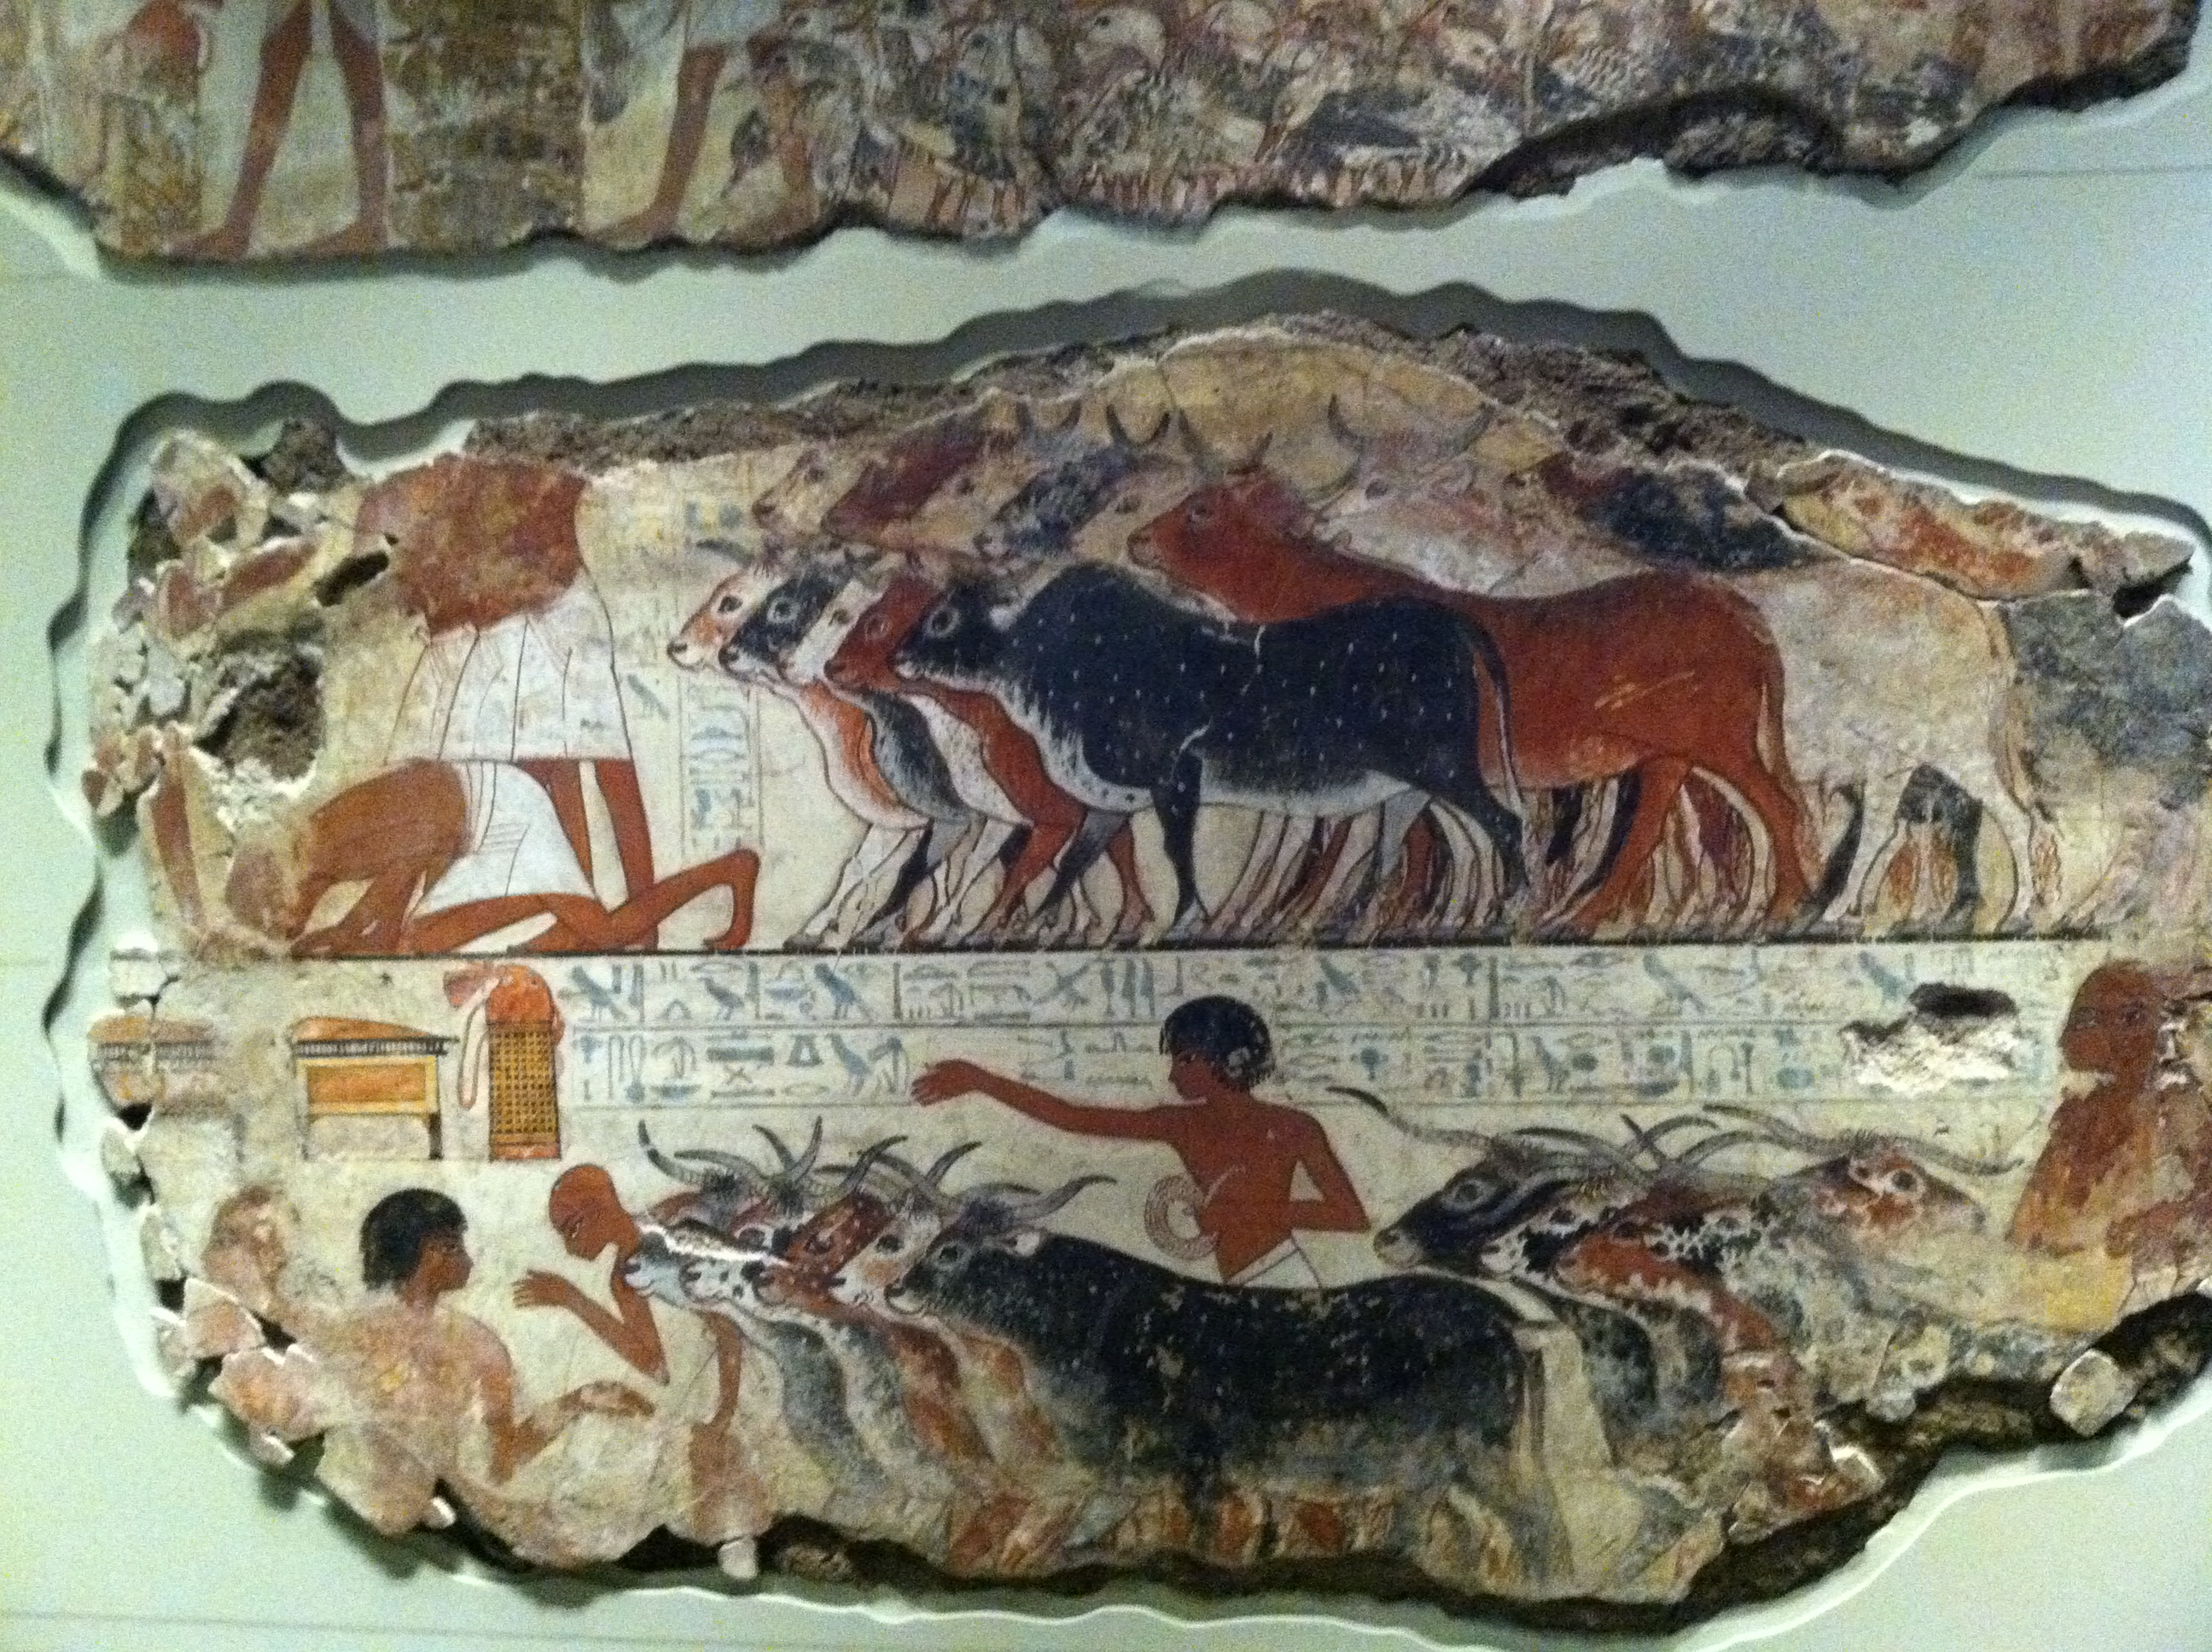 Herding Cattle wall painting from Tomb of Nebamun, ca 1350 BCE, British Museum (Photo P. Hunt, 2013)